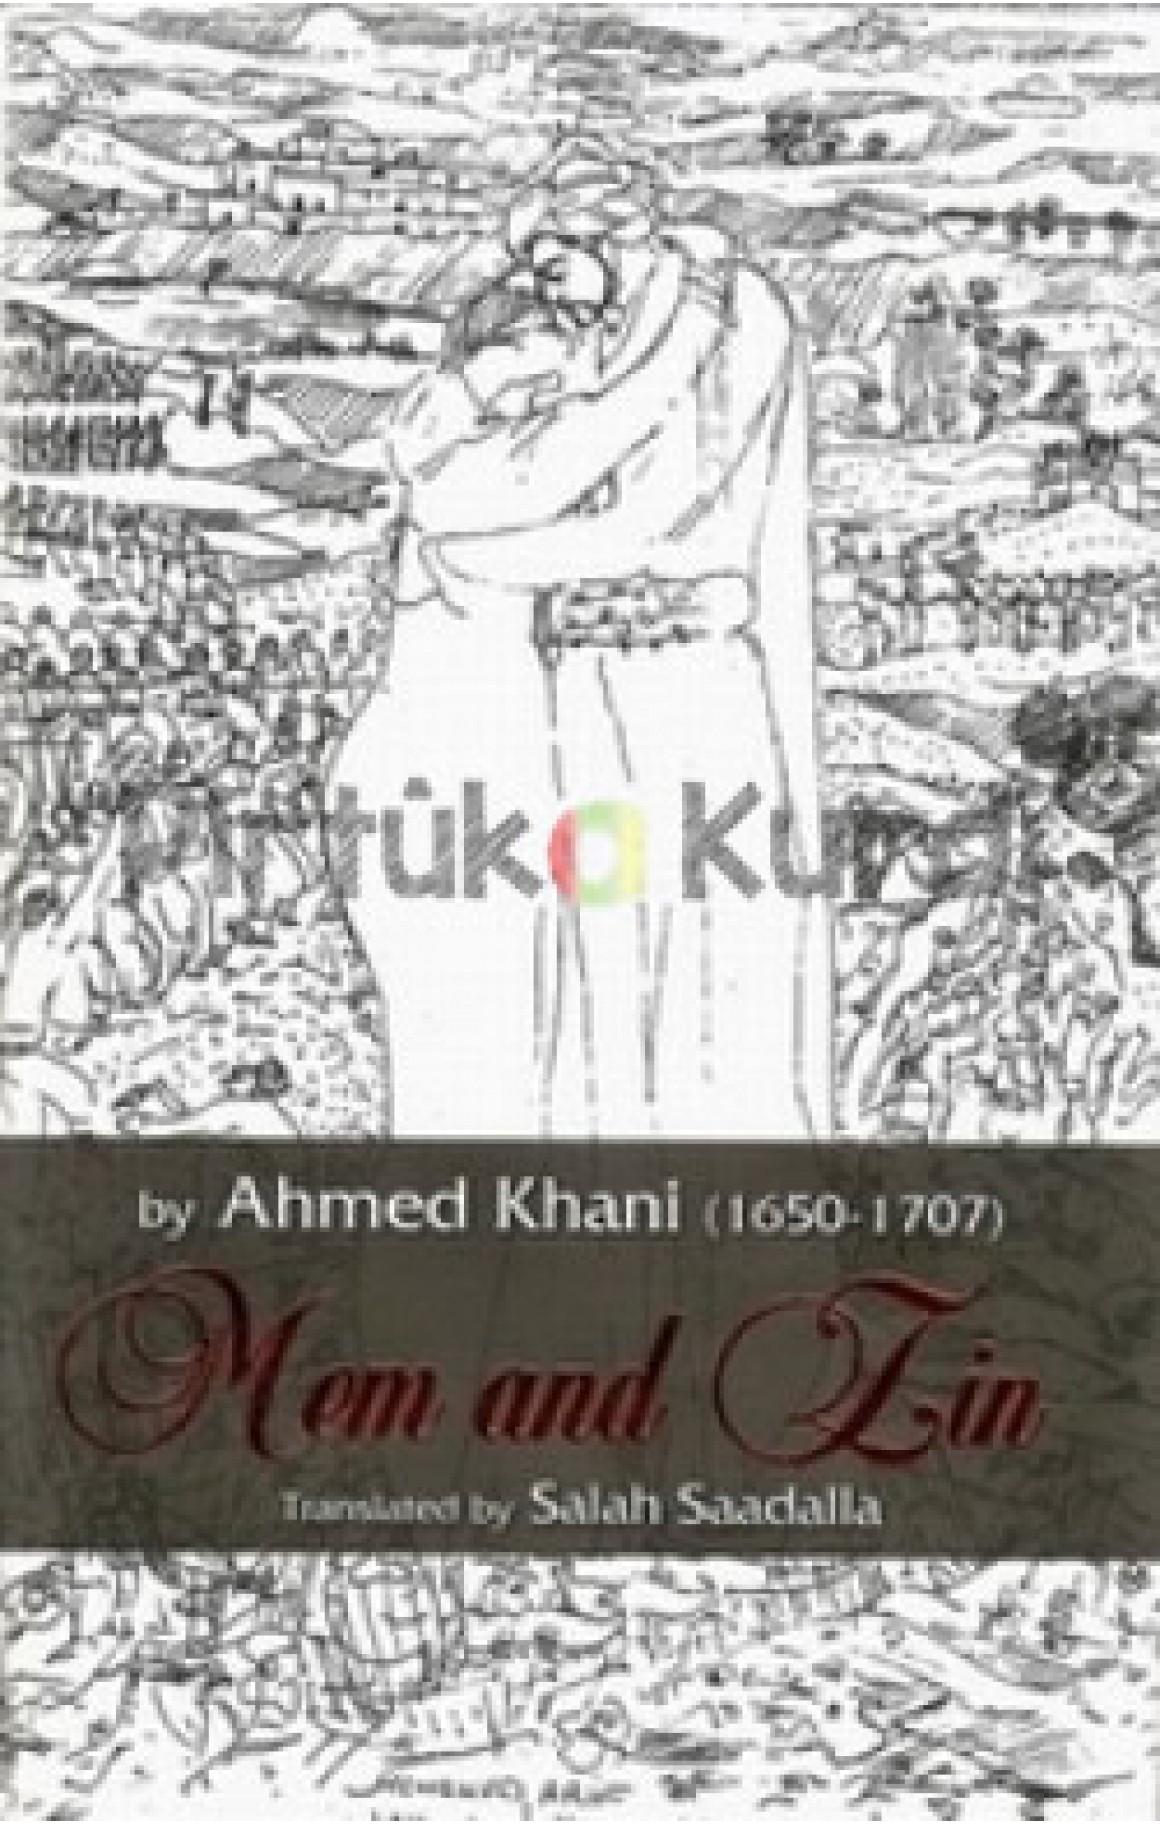 Mem and Zîn-By Ahmed Khani (1650-1707)